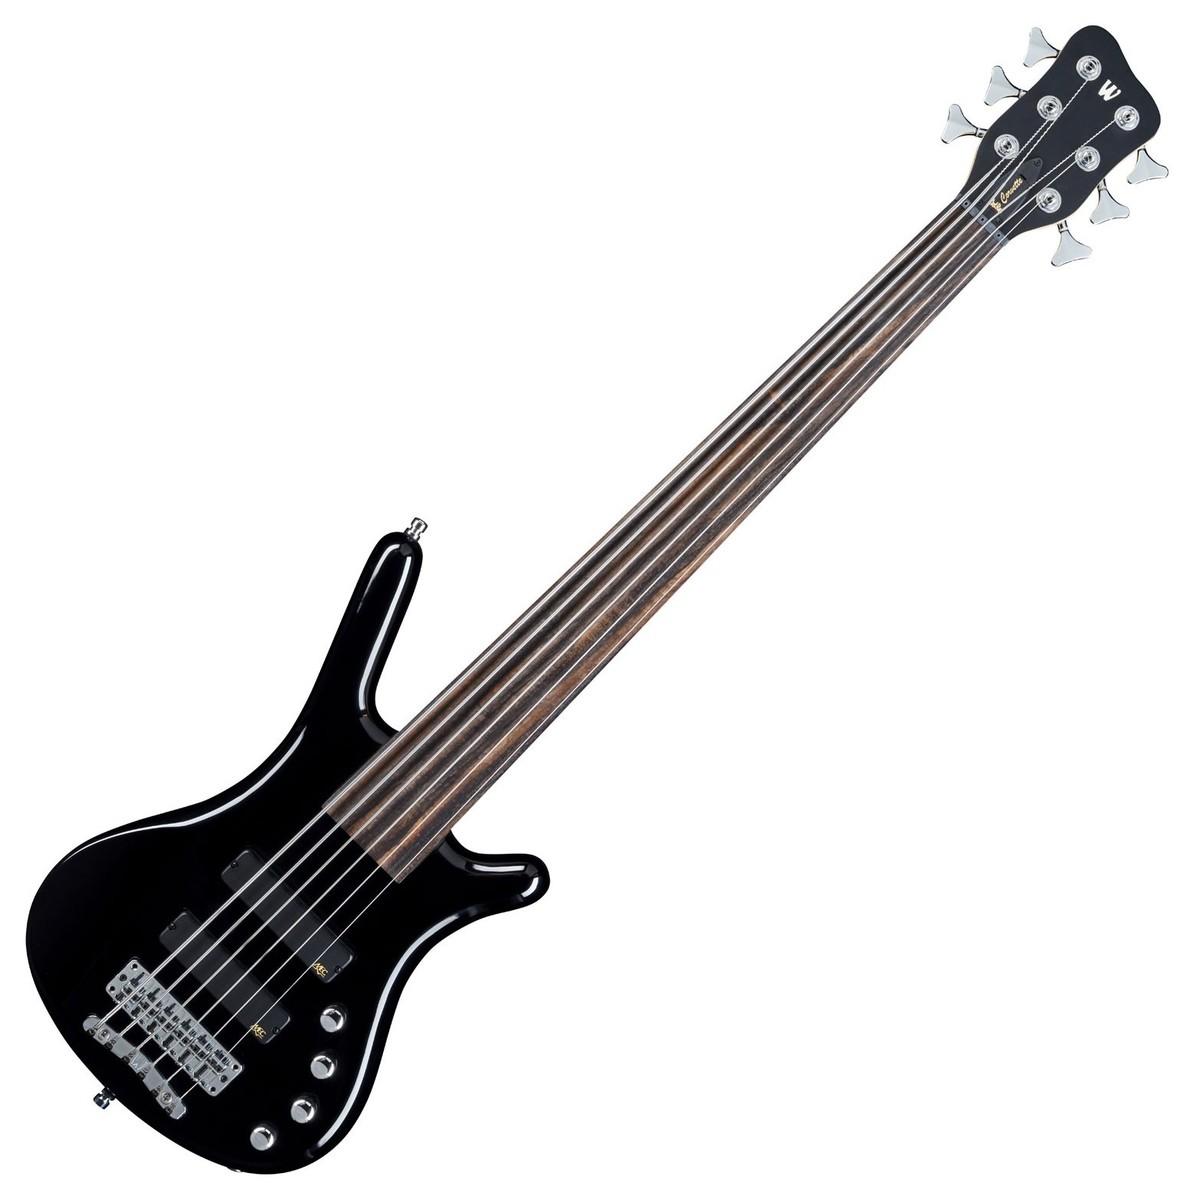 32af5808cd Warwick Rockbass Corvette Basic 6-String Bass, Fretless, Black at Gear4music